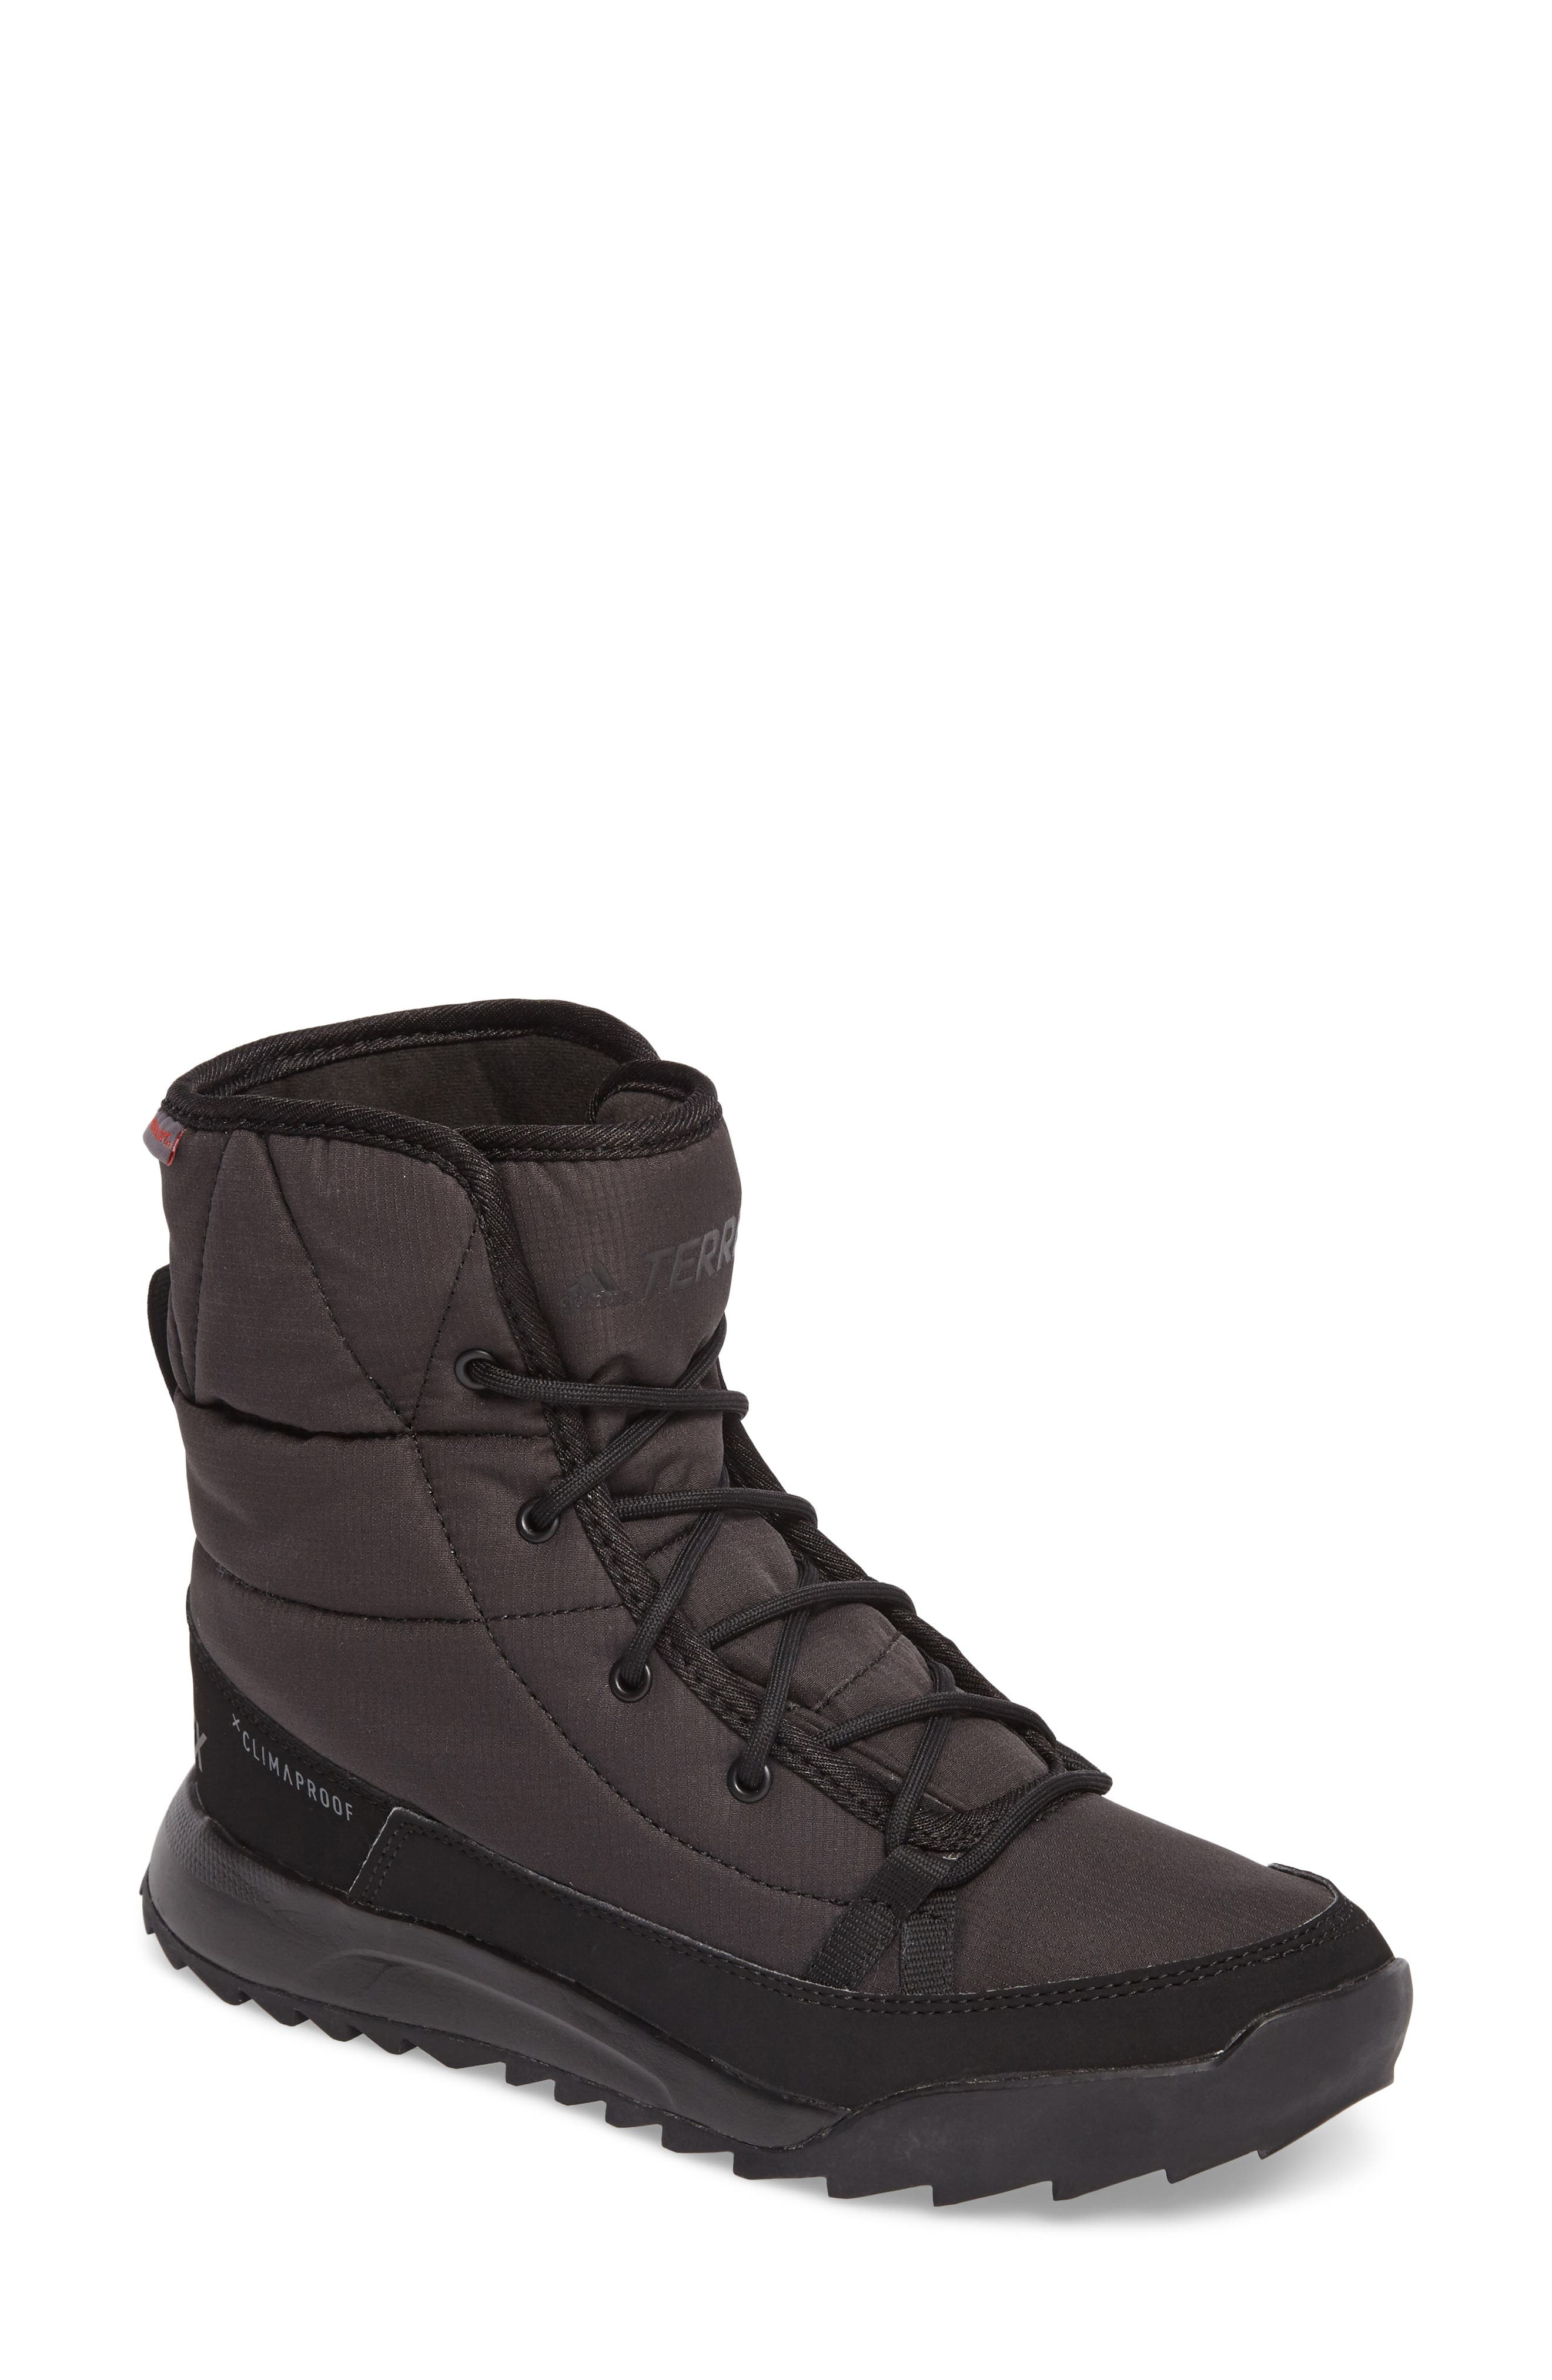 Terrex Choleah Waterproof Boot,                             Main thumbnail 1, color,                             001